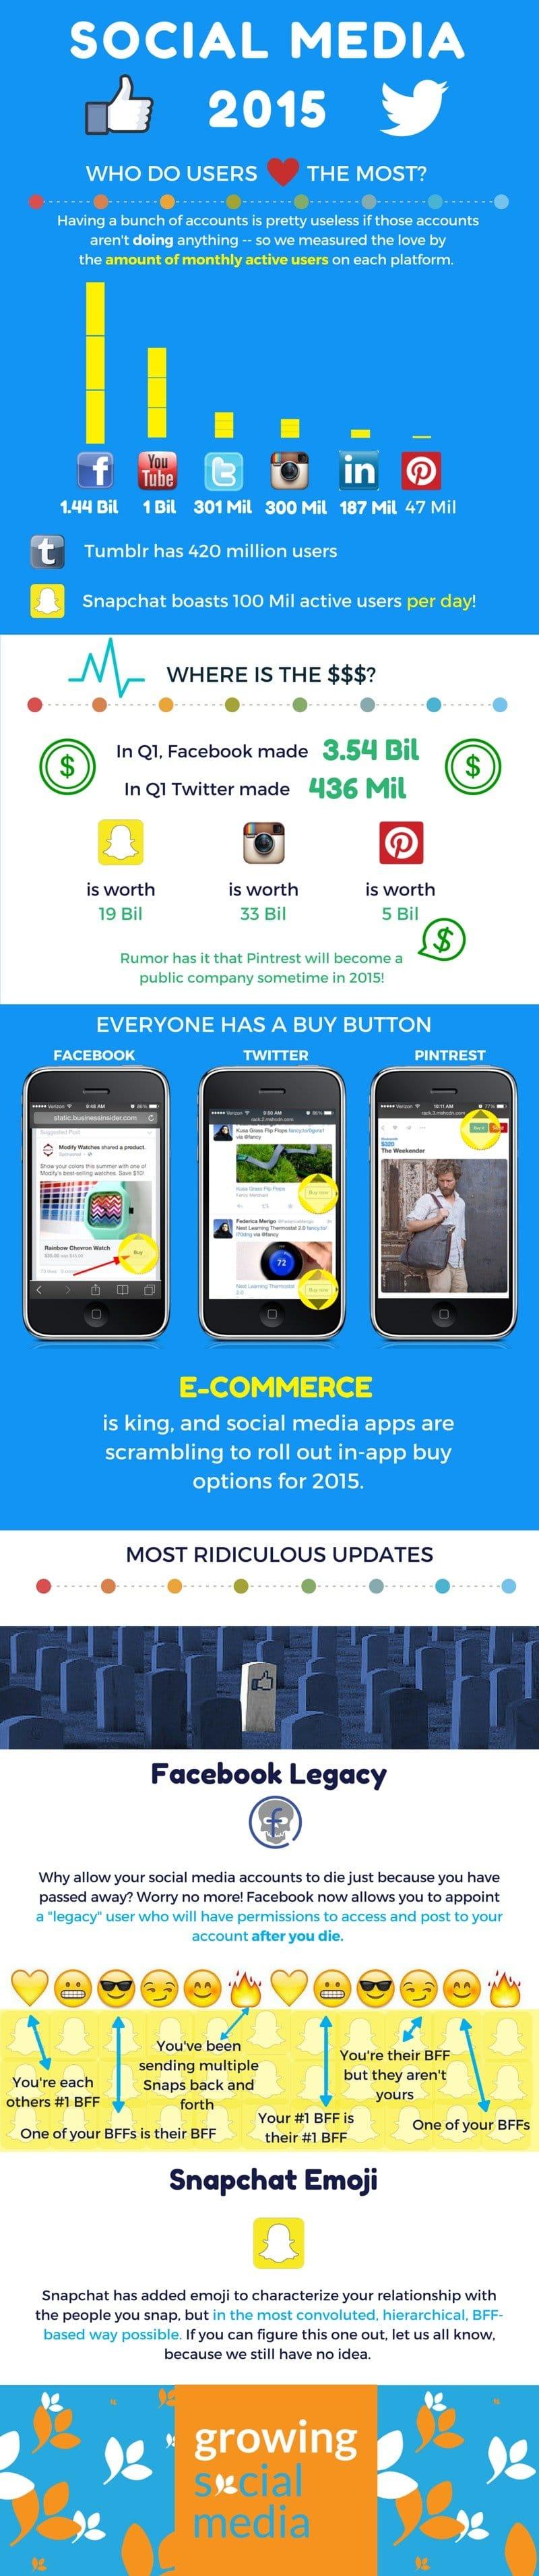 GSM social media infographic